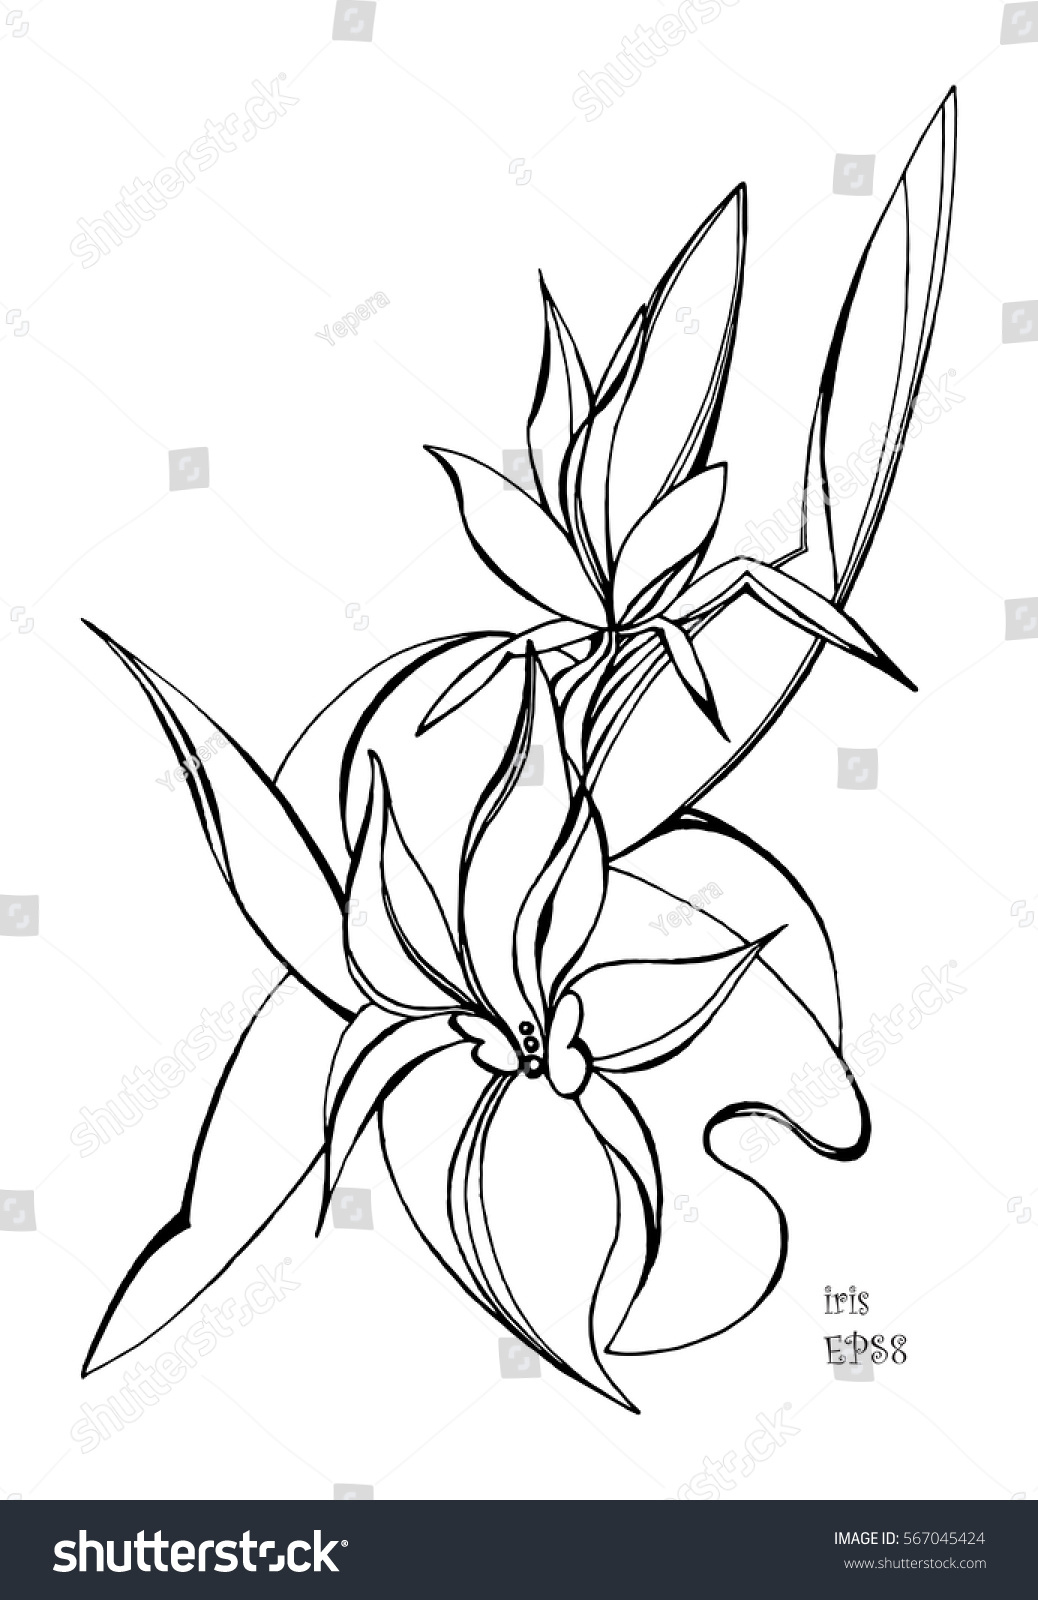 Royalty Free Iris Flowers Hand Drawn Vector 567045424 Stock Photo